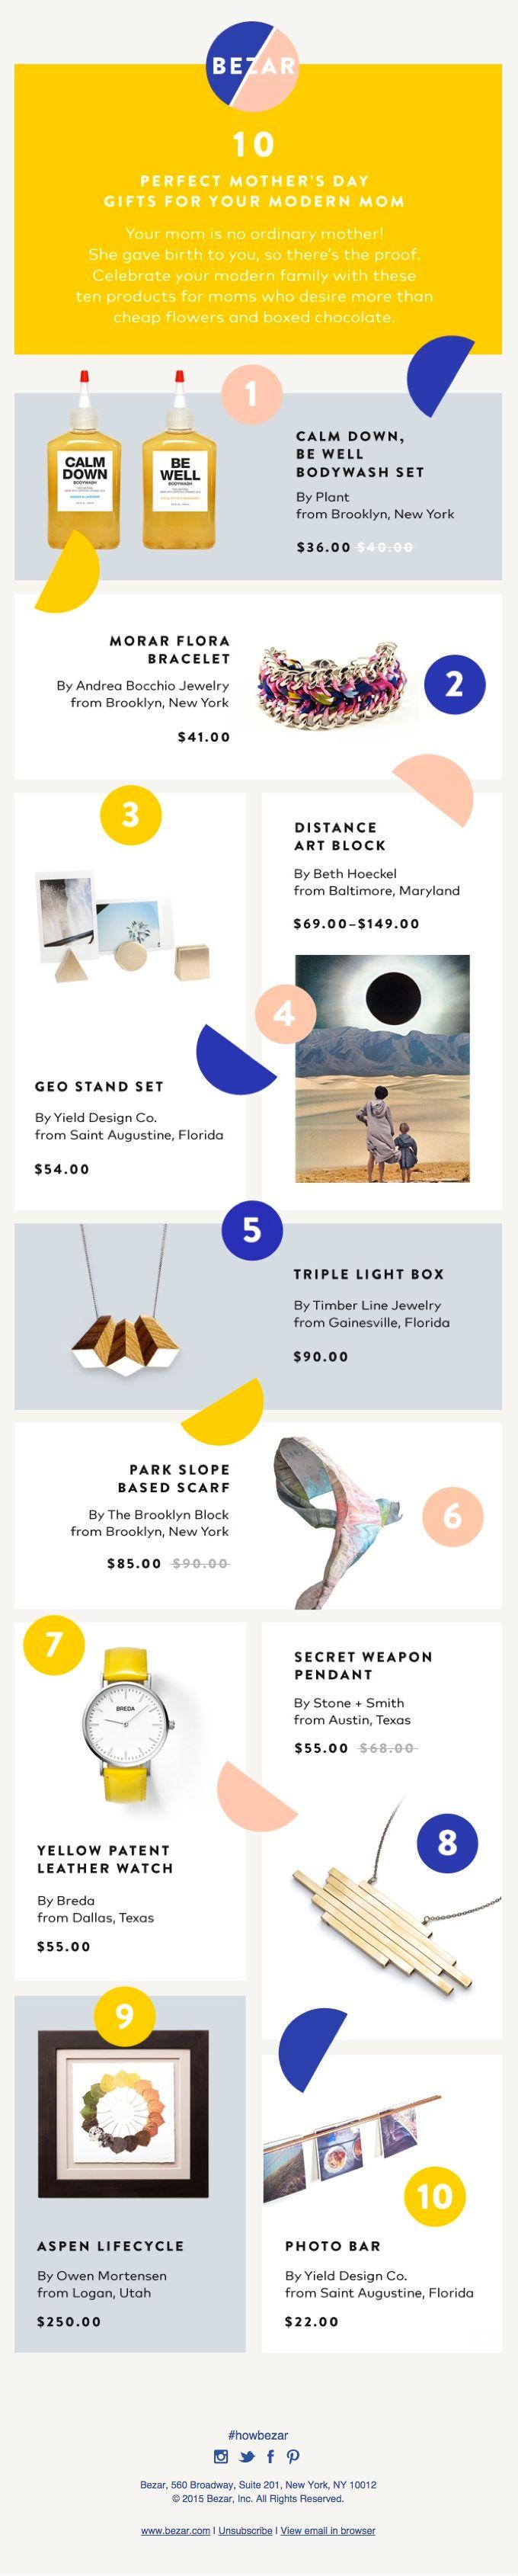 103 best email design inspiration images on pinterest email